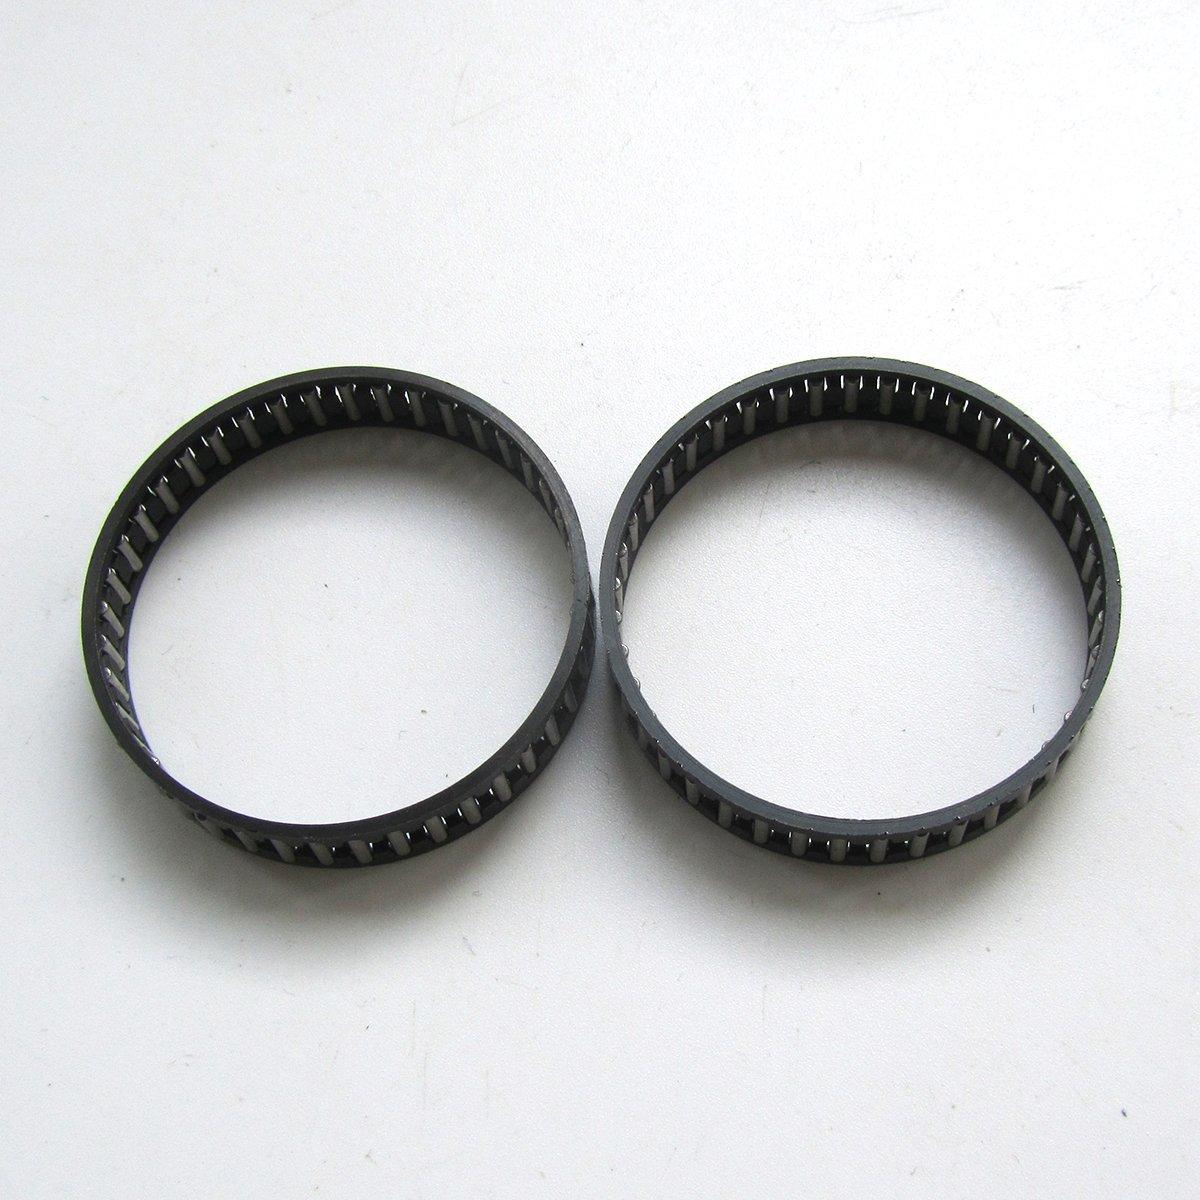 KUNPENG - # 634400020000=634400010000 2 piezas de jaula de aguja ...